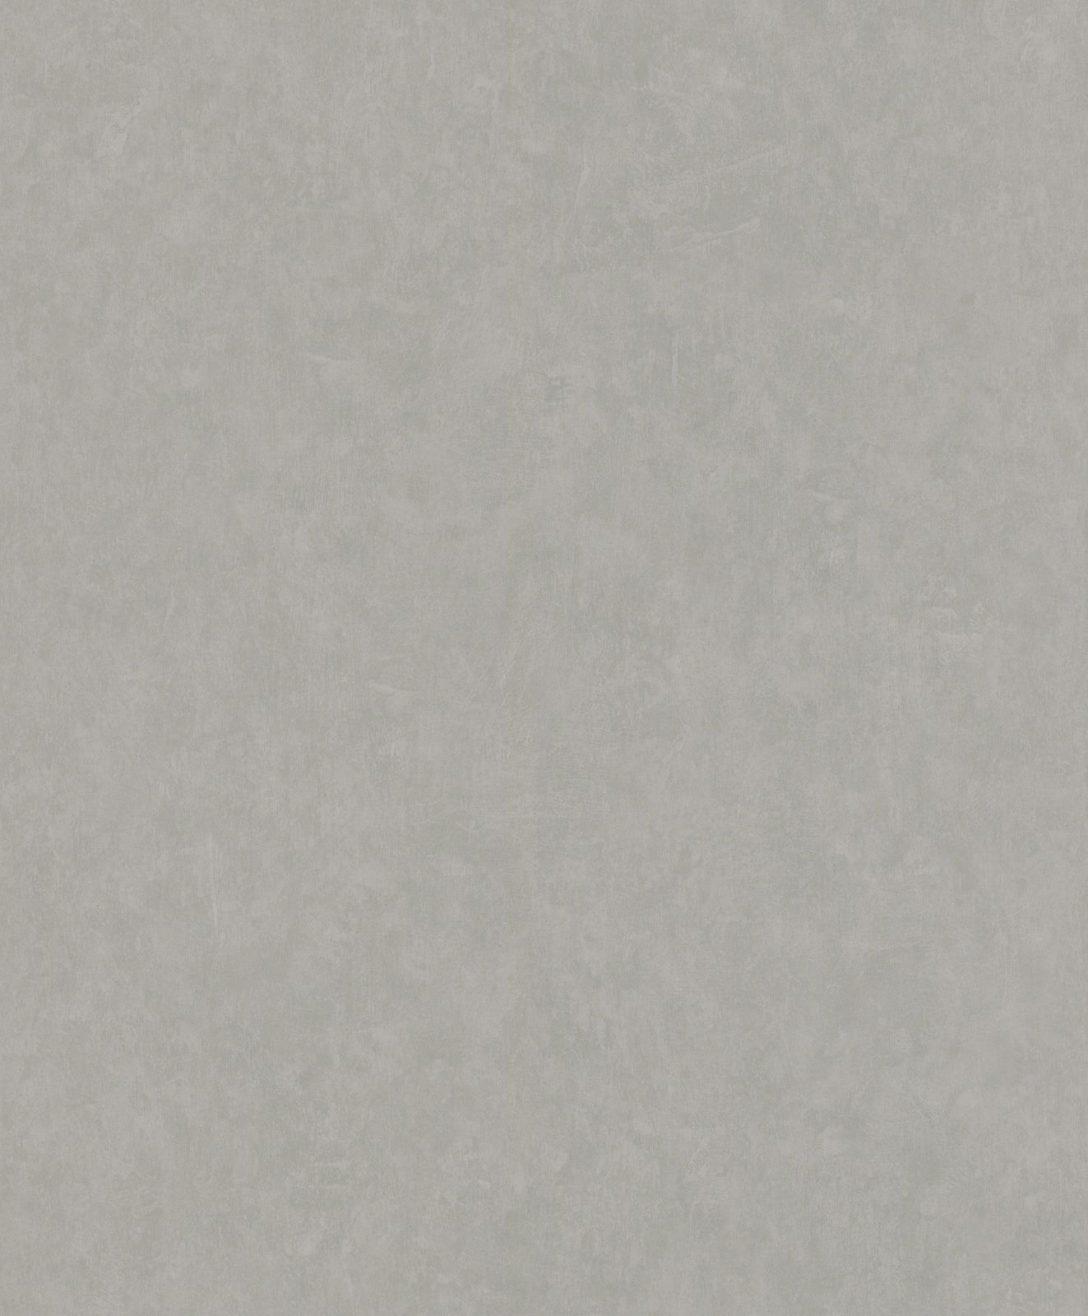 Large Size of Alpina Betonoptik Beton Optik Hellgrau Farbrezepte Effektfarbe Beton Optik Komplett Set Bauhaus Feine Farben Obi Video Grau Toom Tapete Vlies Design Dunkelgrau Wohnzimmer Alpina Betonoptik